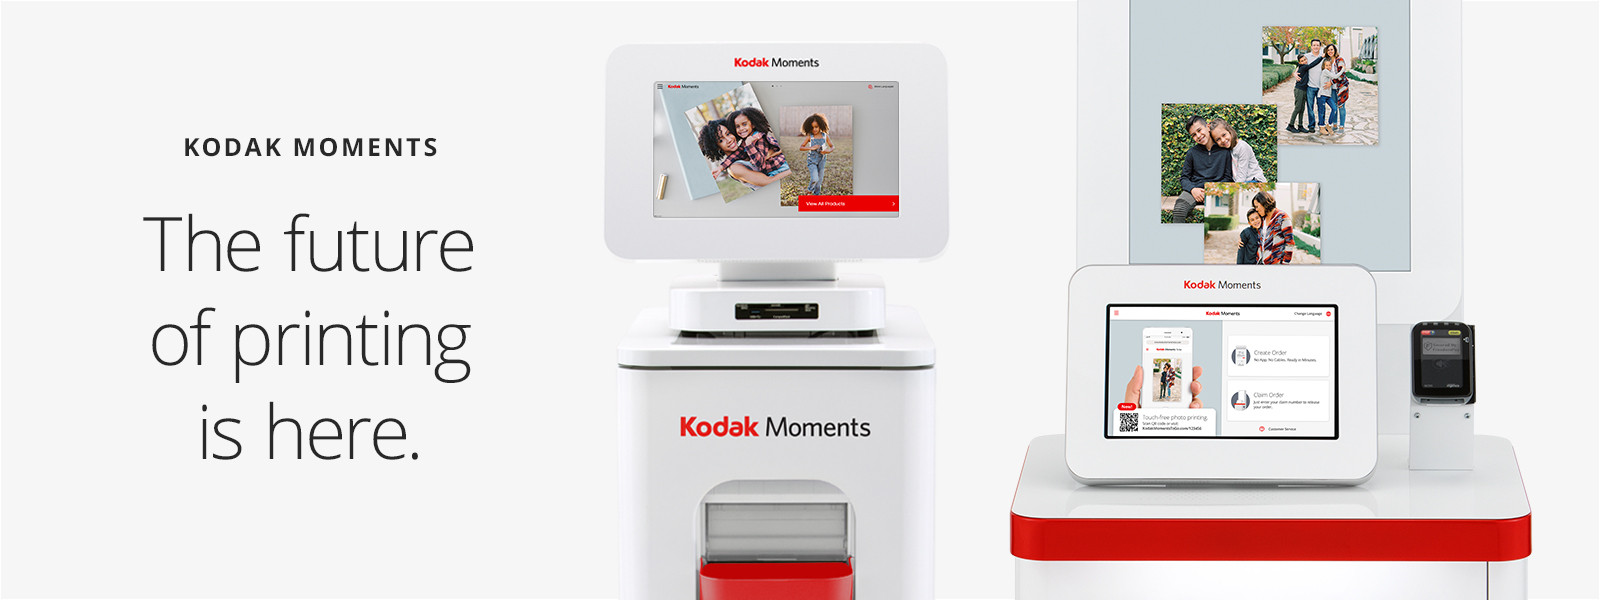 Kodak Moments for Retailers